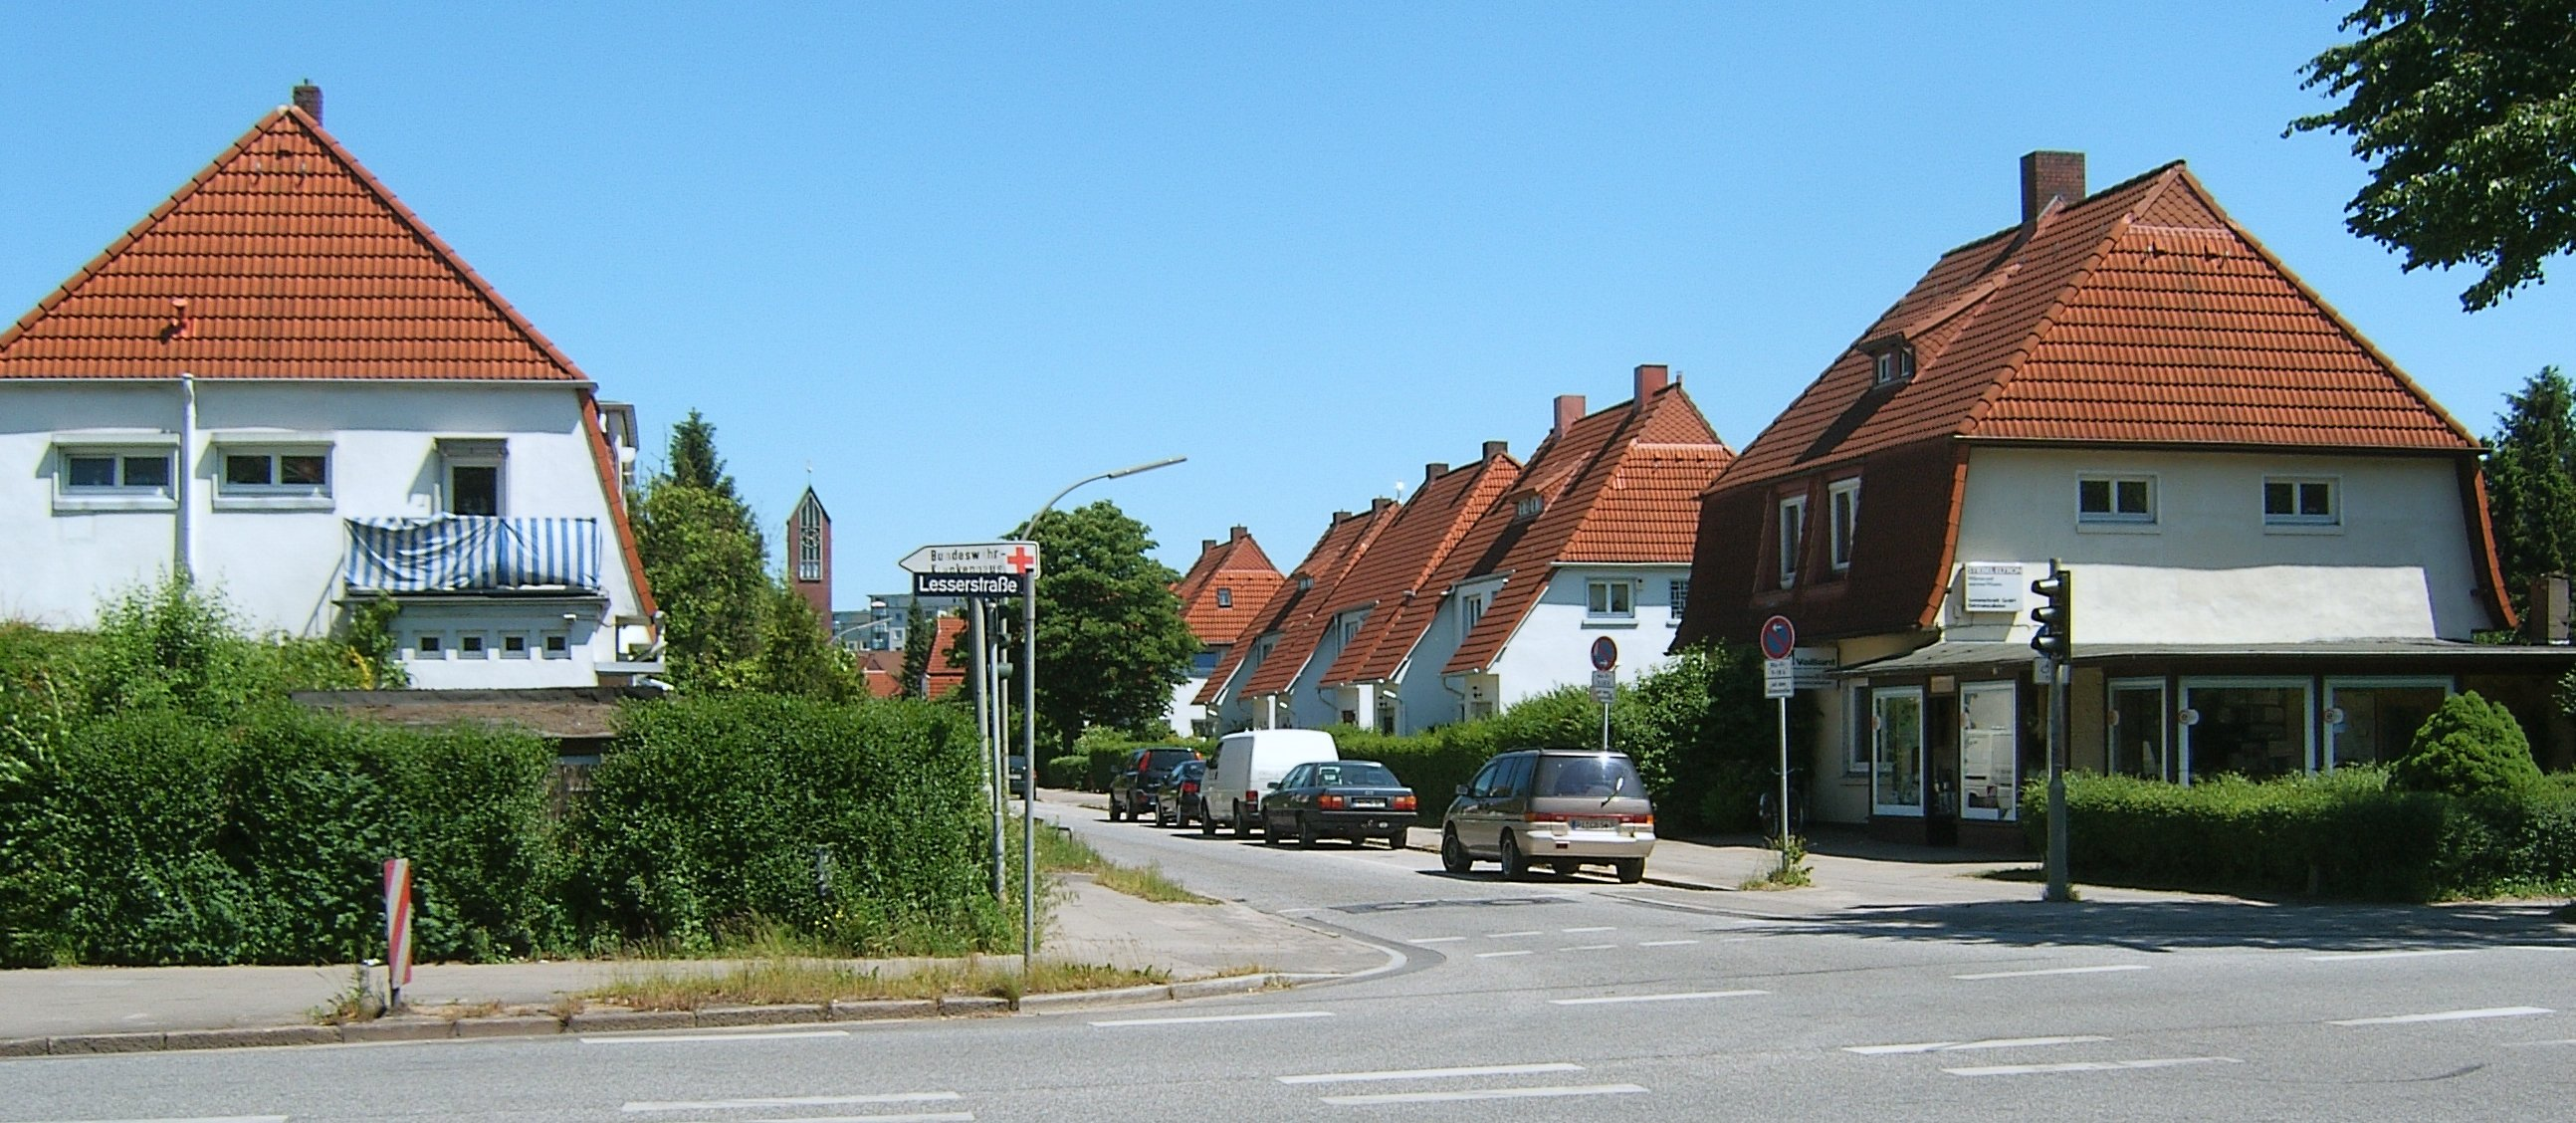 Friseur hamburg wandsbek gartenstadt